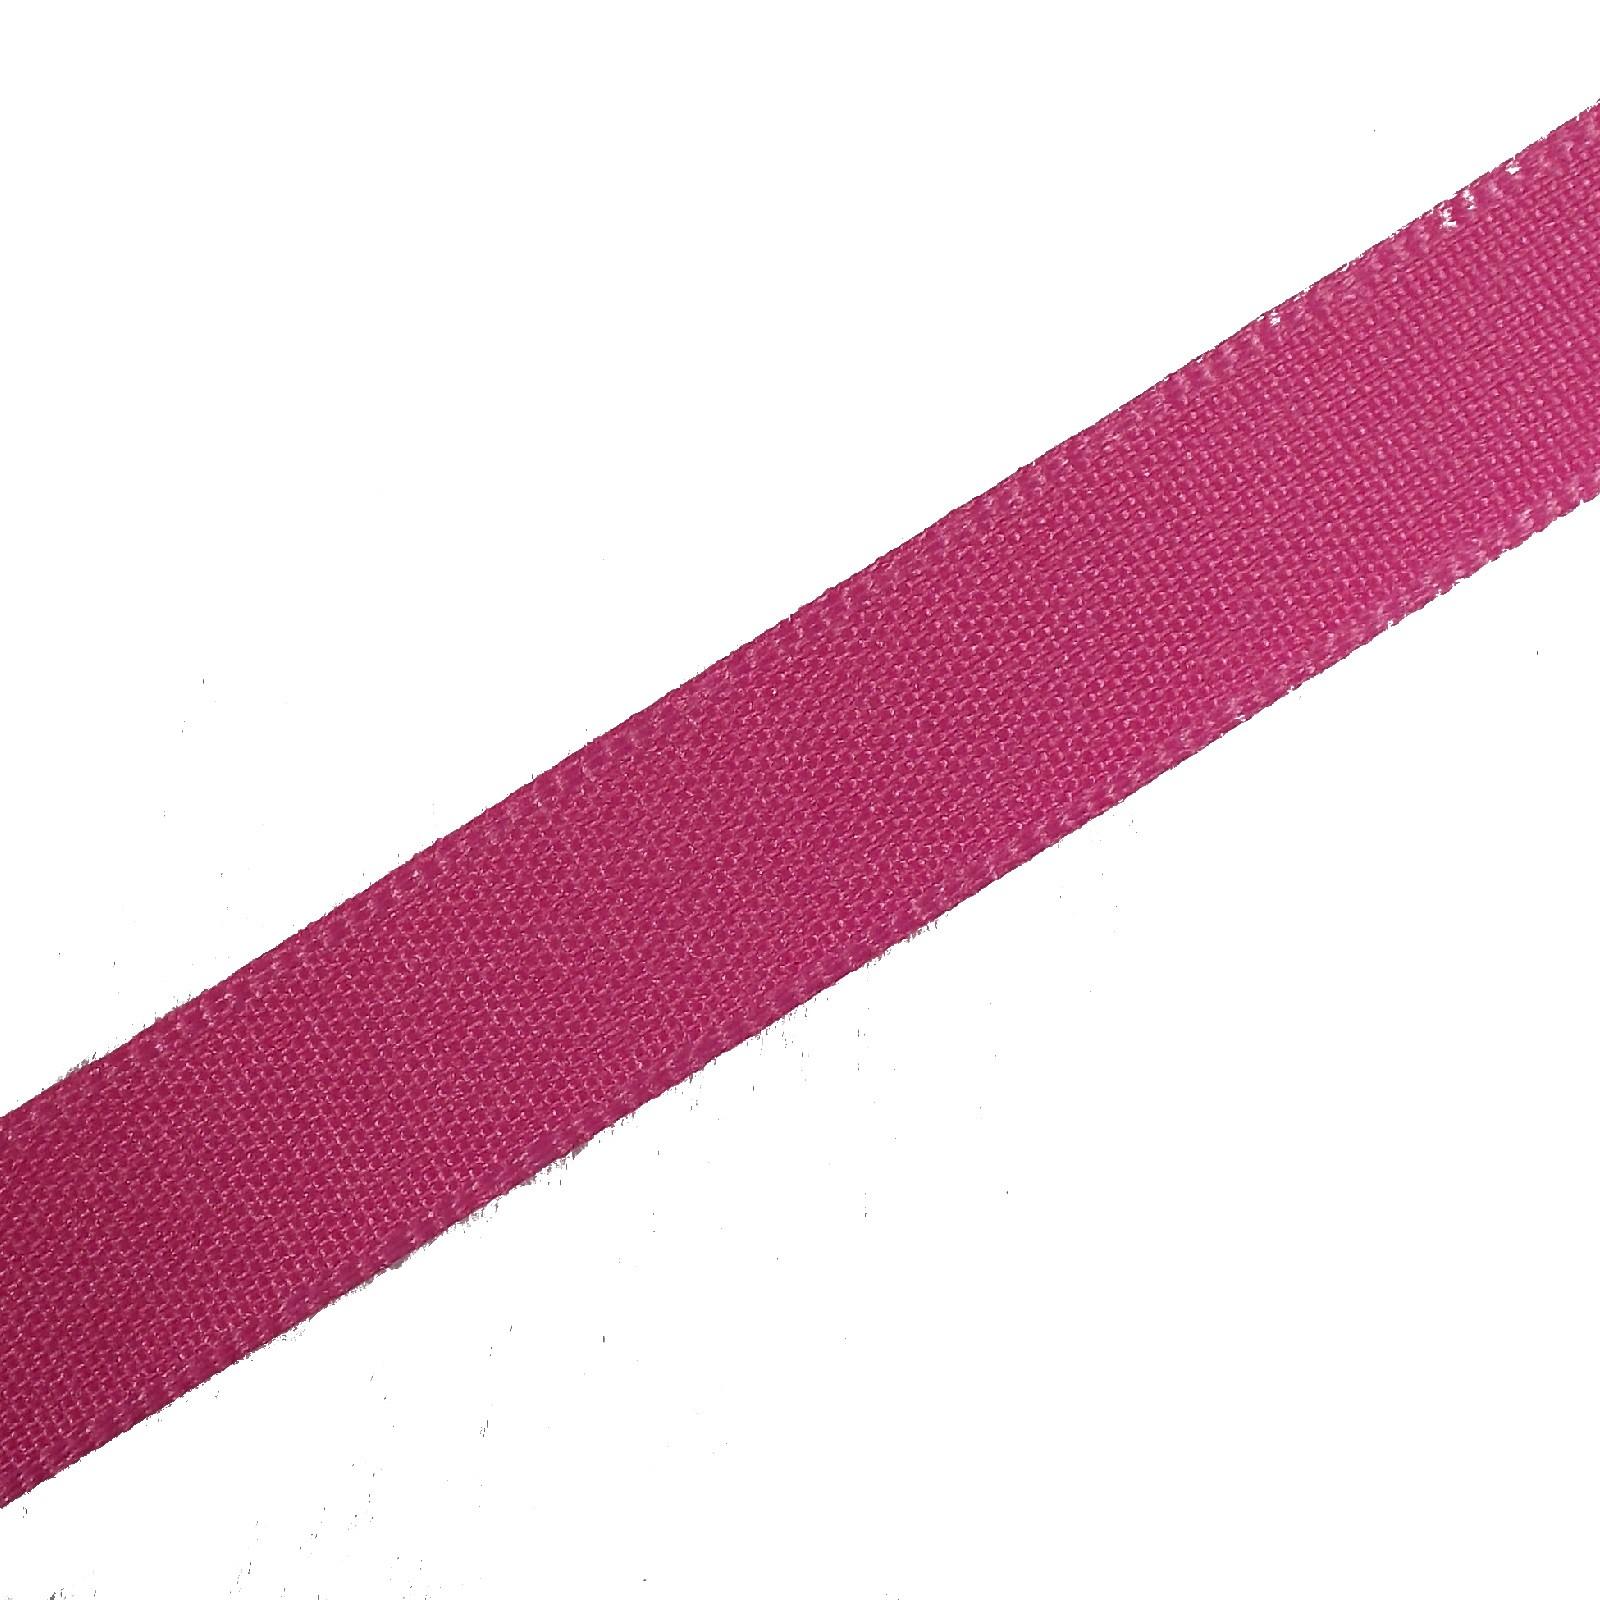 Berisfords Seam Binding Polyester Ribbon Tape 12mm wide Hot Pink 1 metre length